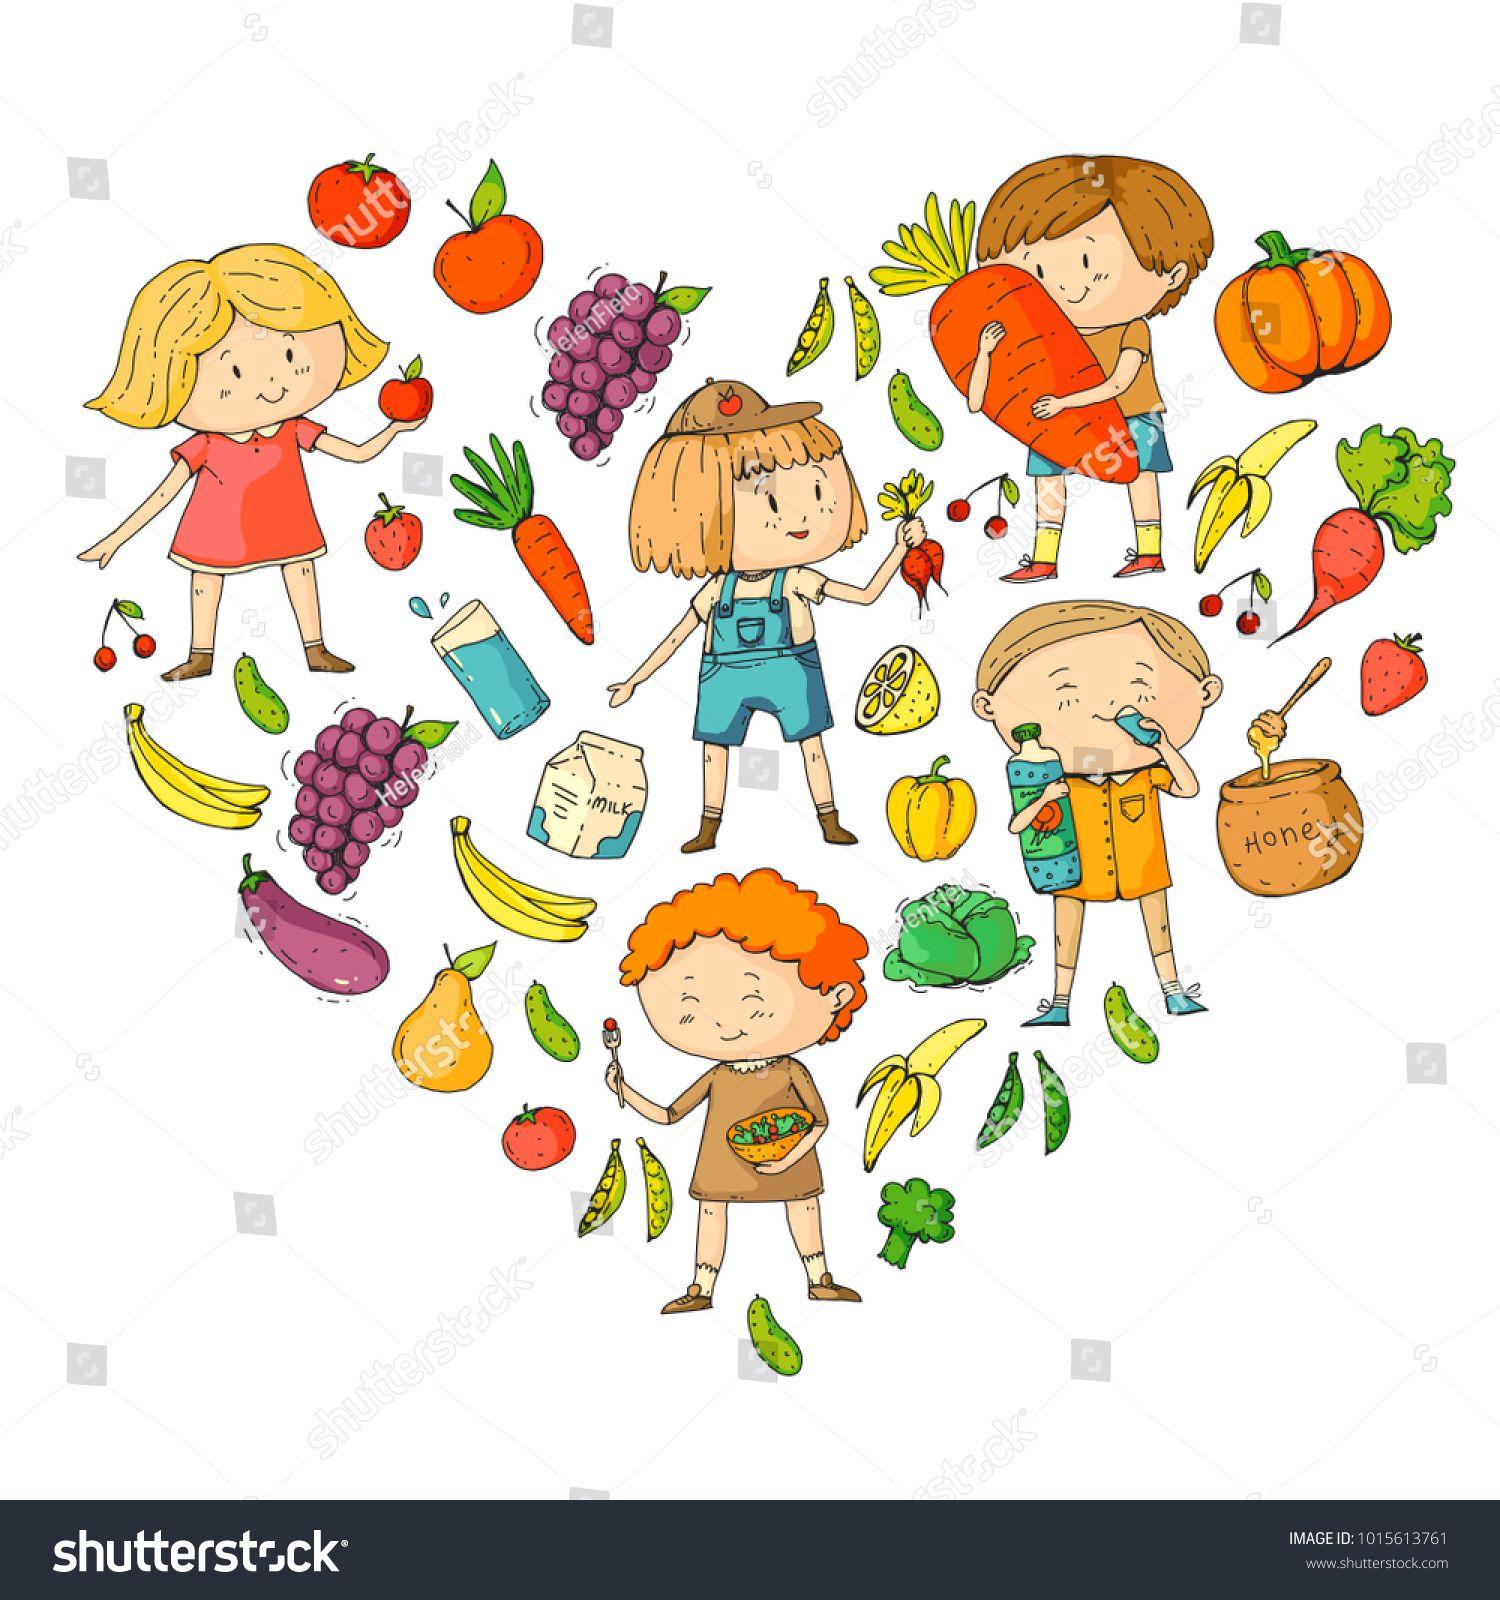 Children School And Kindergarten Healthy Food And Drinks Kids Cafe Fruits And Vegetables Boys And Girls Eat Healt Kids Cafe Preschool Patterns Kids School